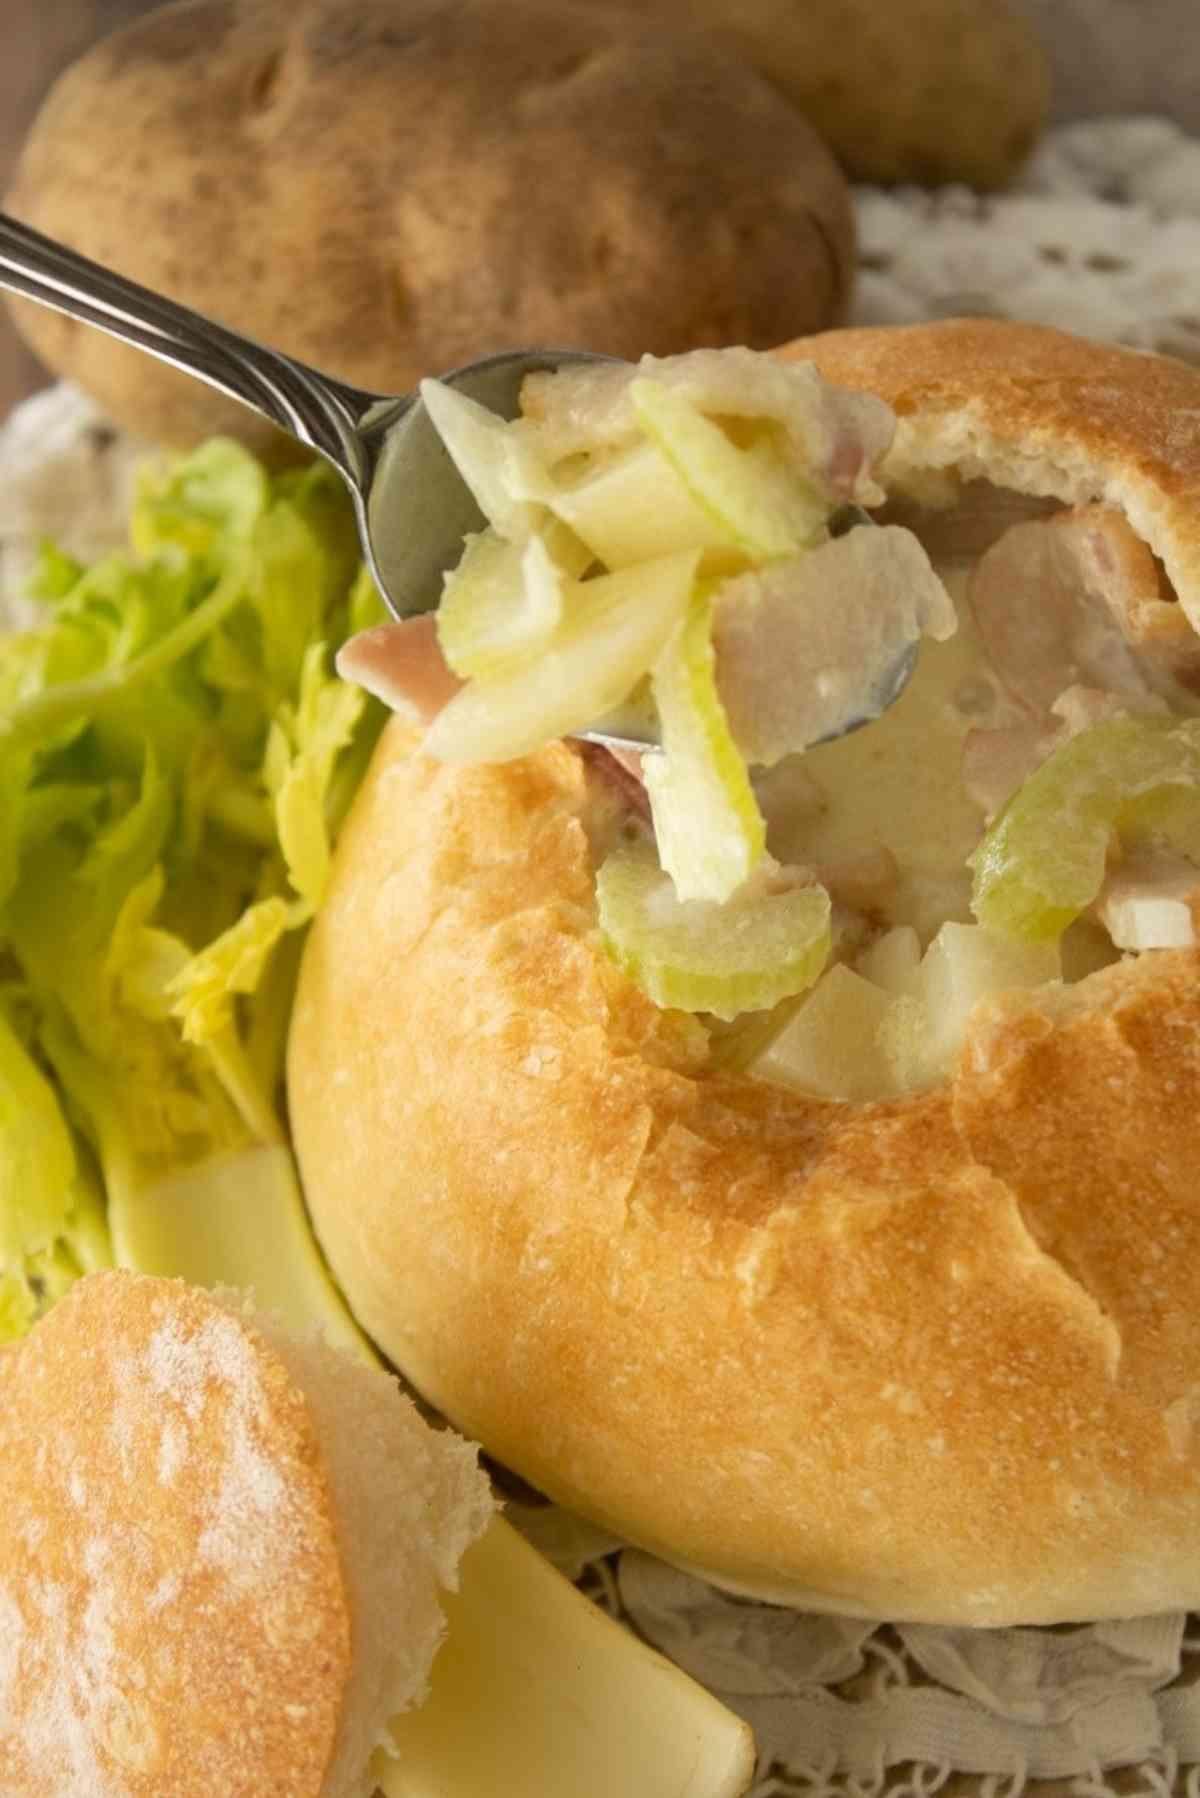 Homemade french bread bowl full of potato soup!